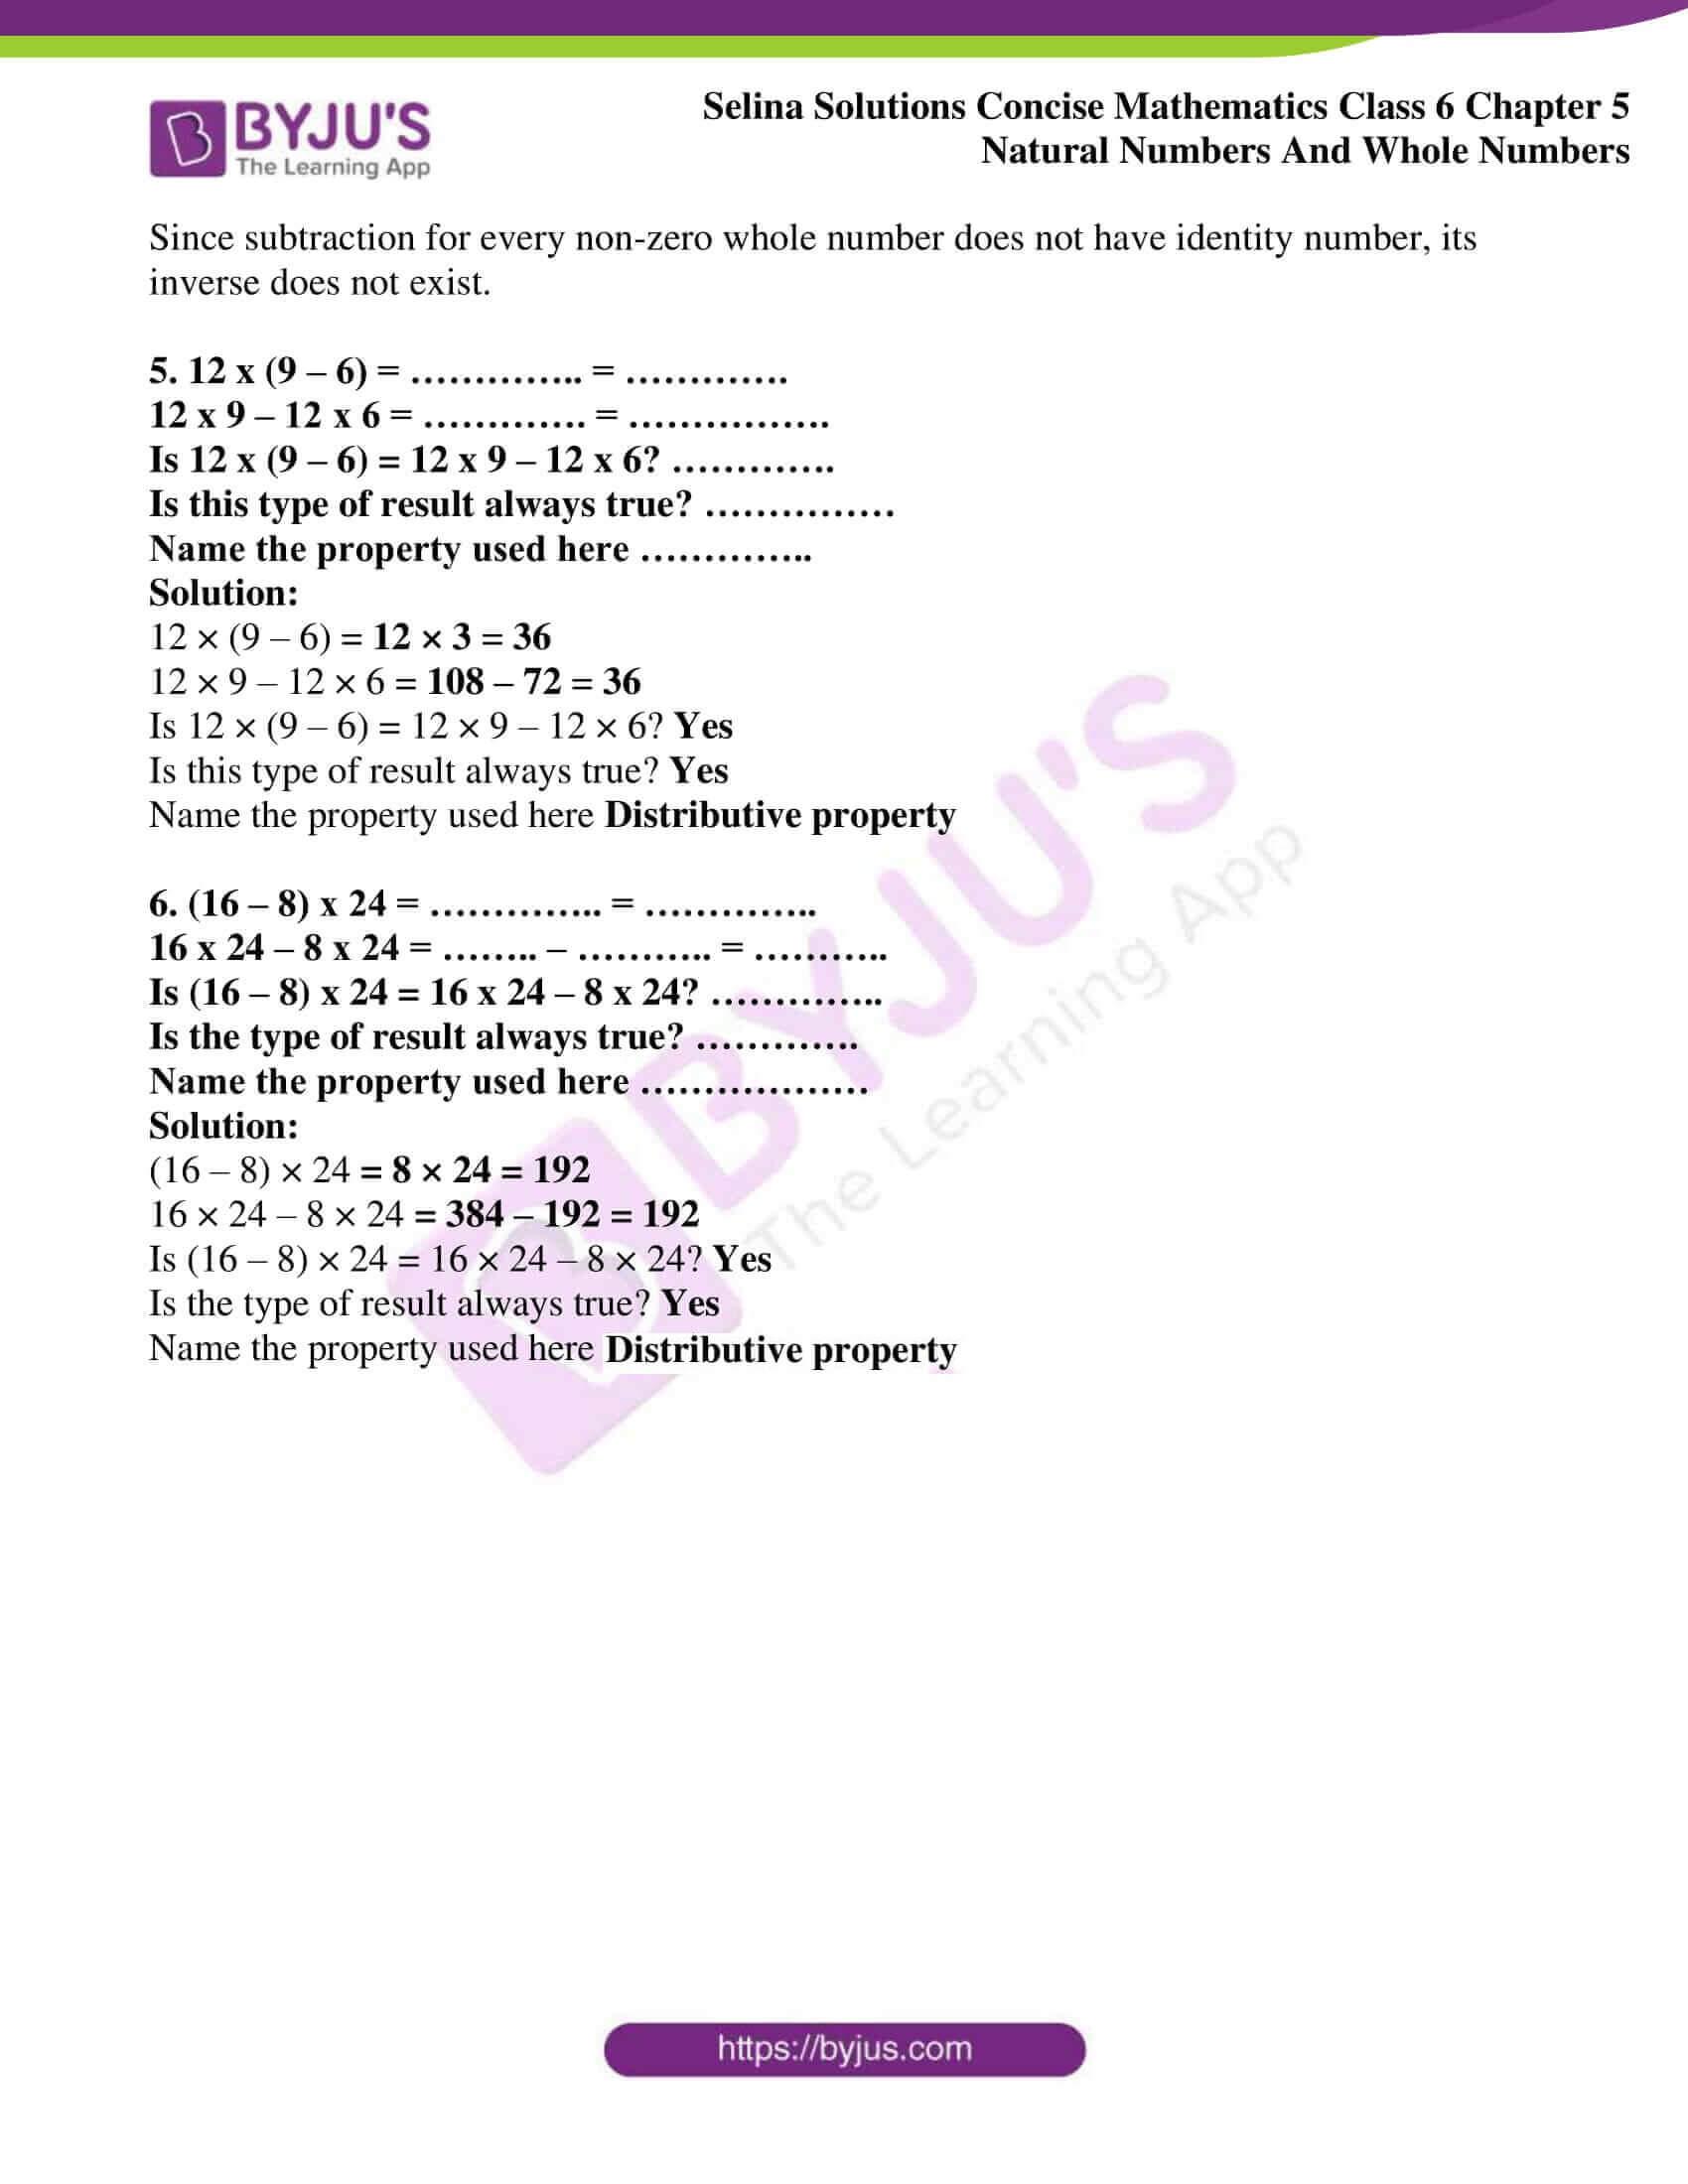 selina sol concise maths class 6 ch5 ex 5b 2